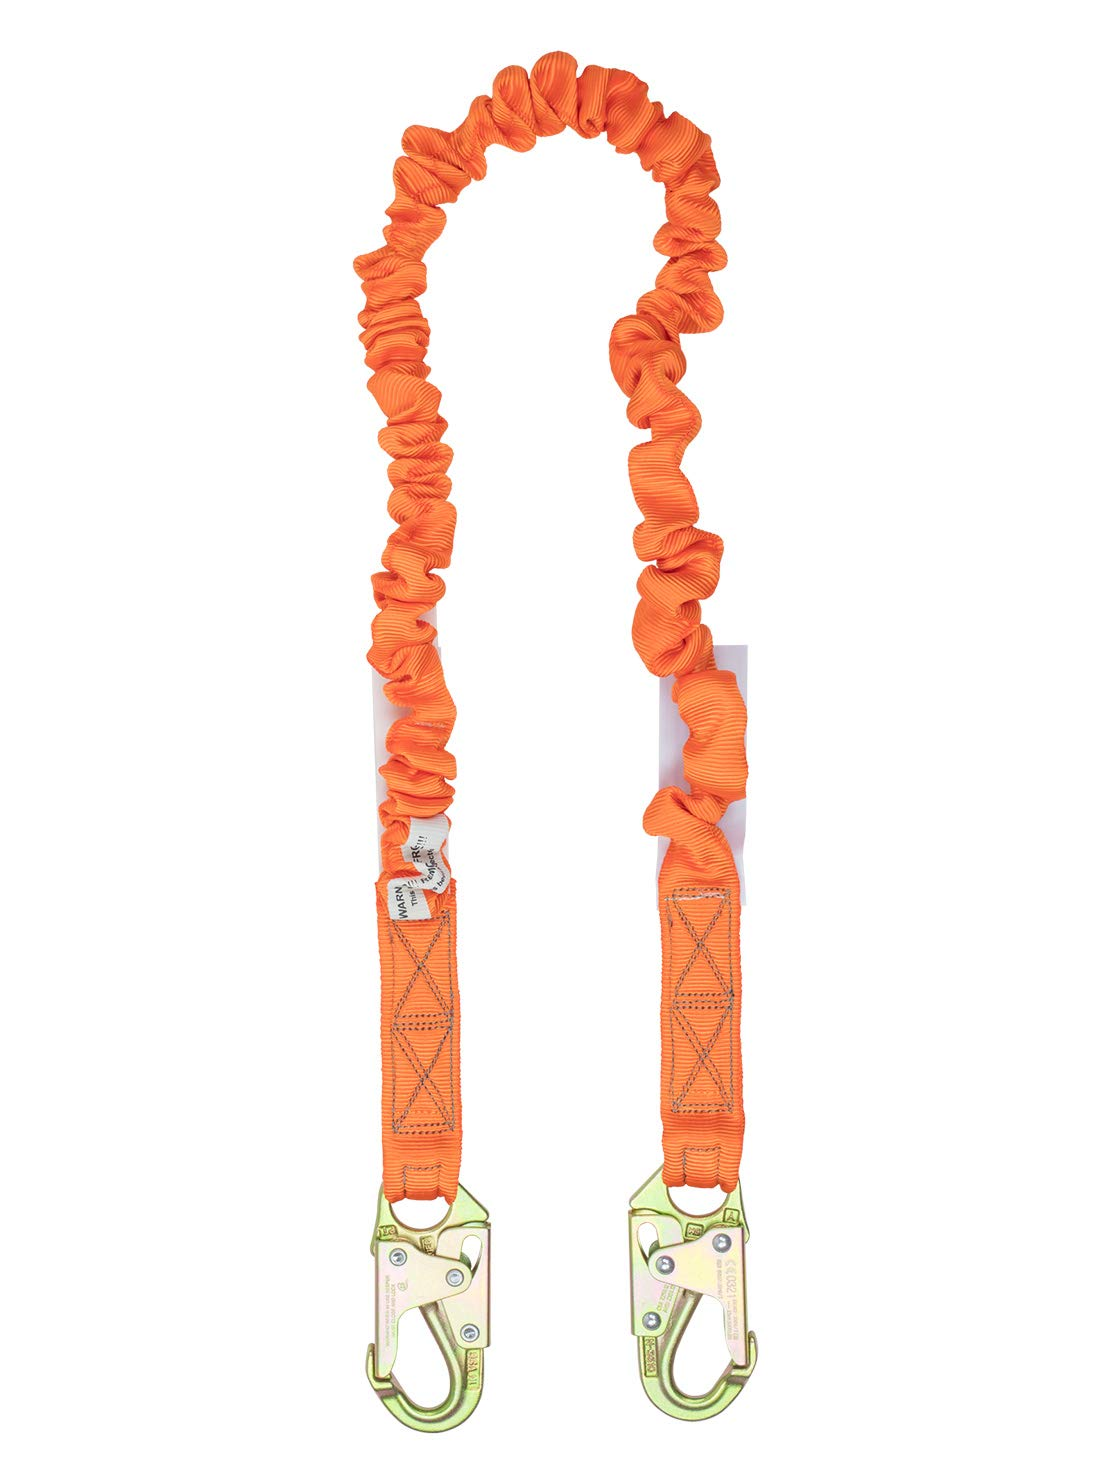 Single Leg Stretch Internal Shock Absorbing Lanyard - 2 Steel Snap Hooks - Industrial Webbing - 4.5 to 6 feet, OSHA/ANSI Compliant by Malta Dynamics